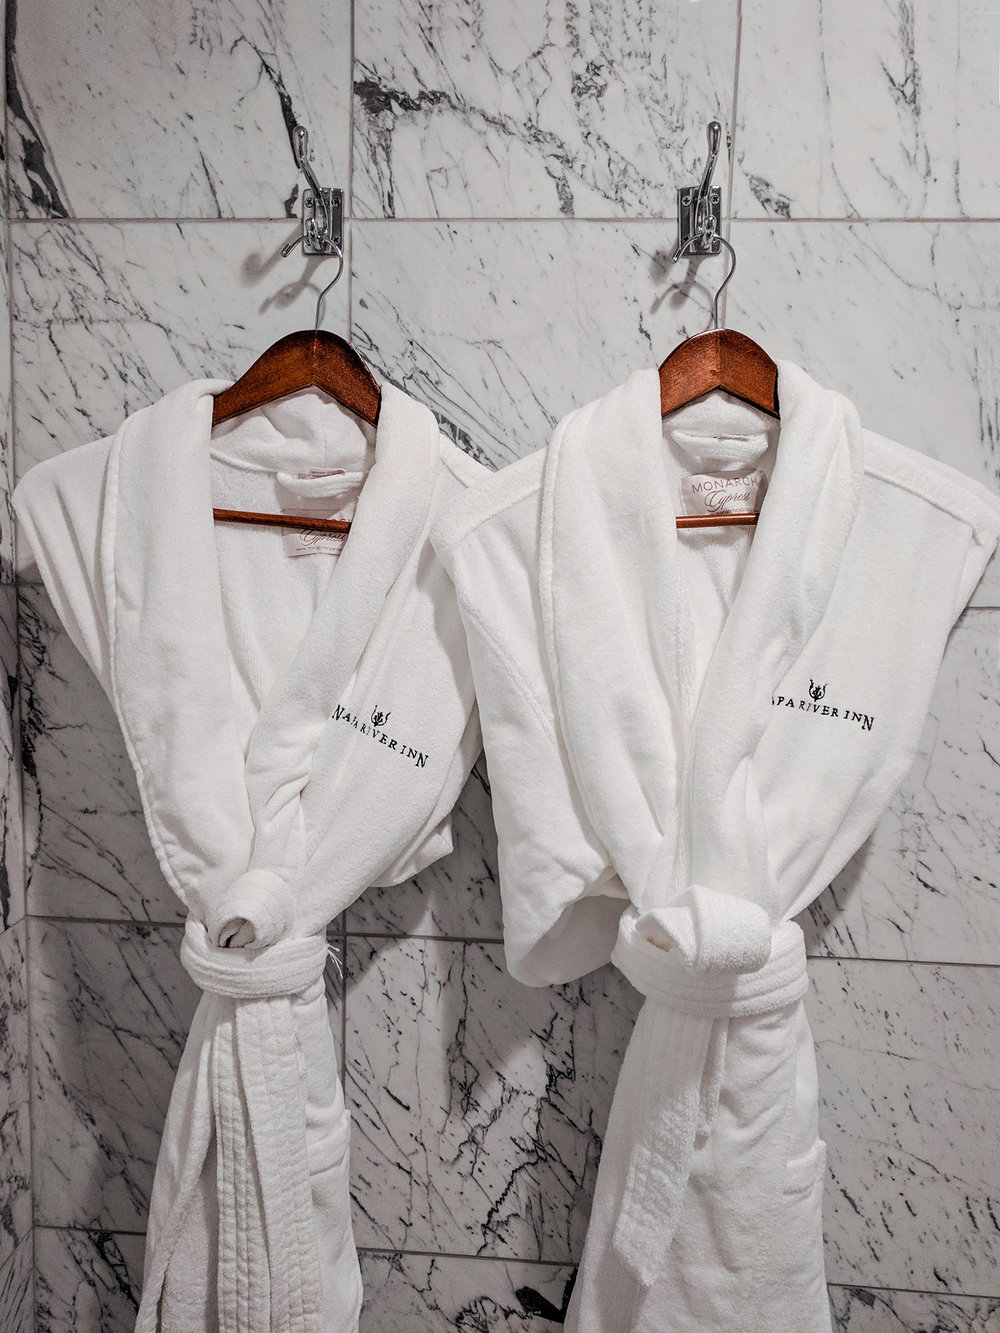 Napa River Inn robes